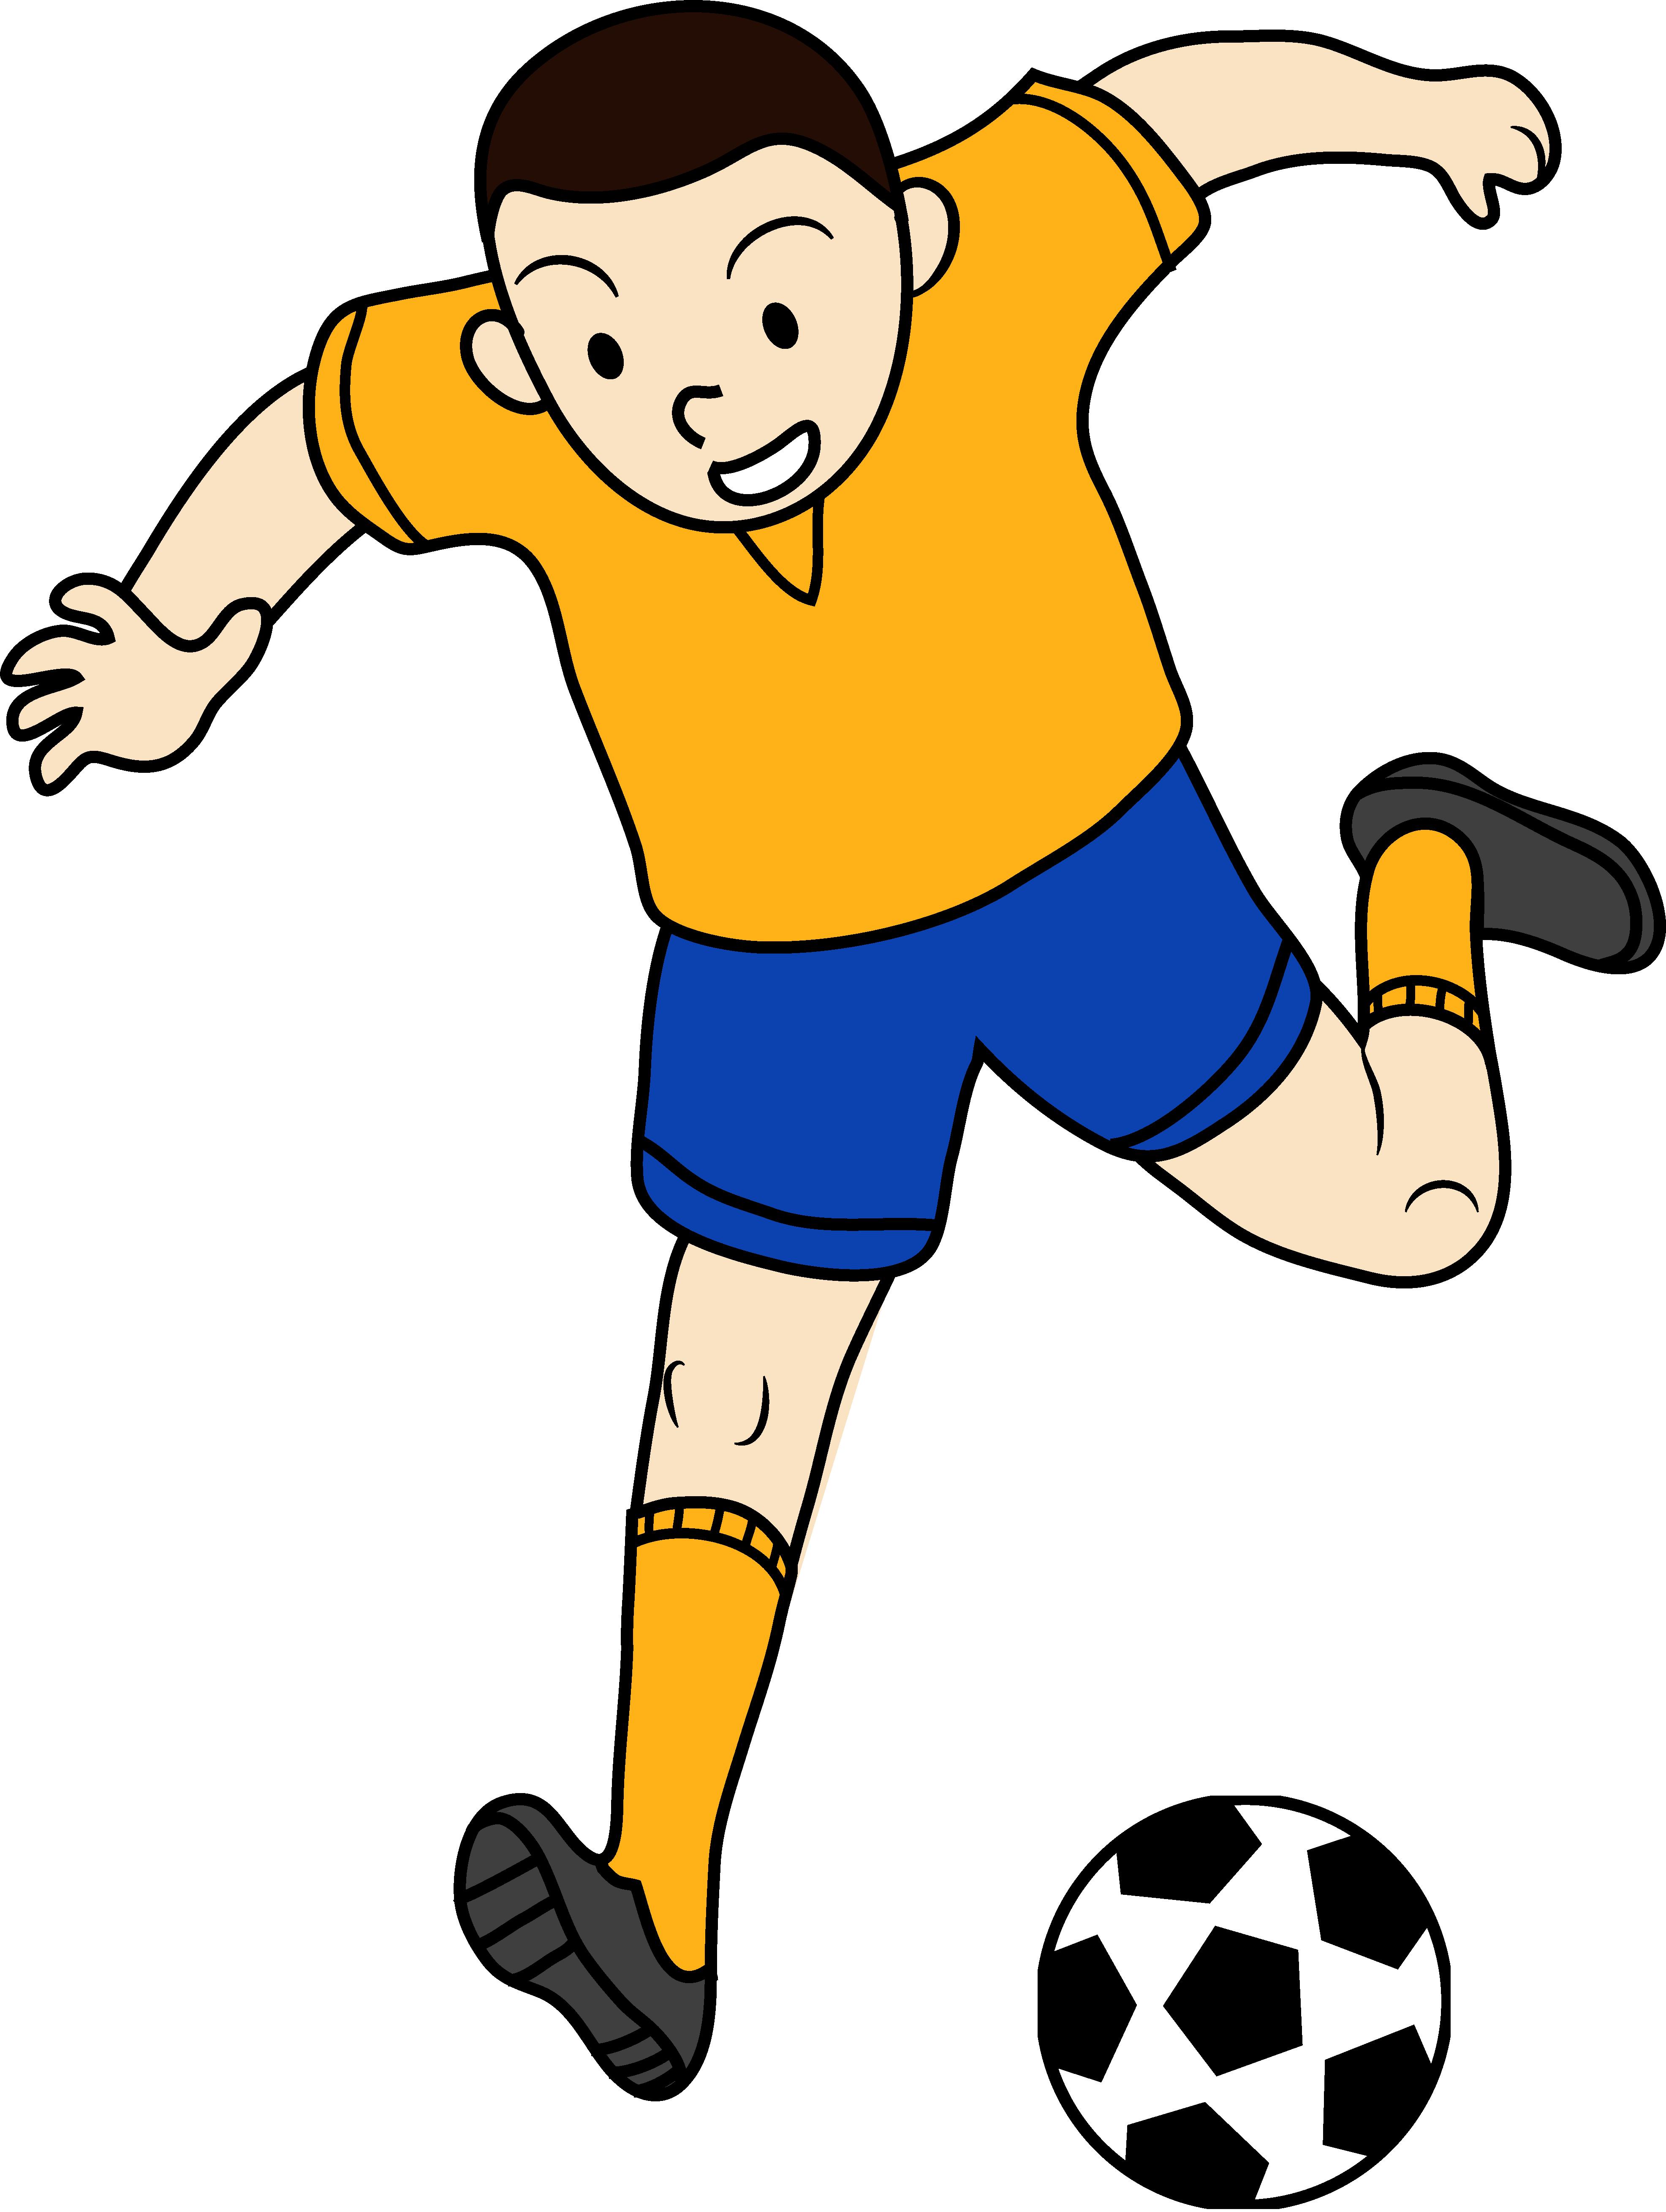 Kid football player.